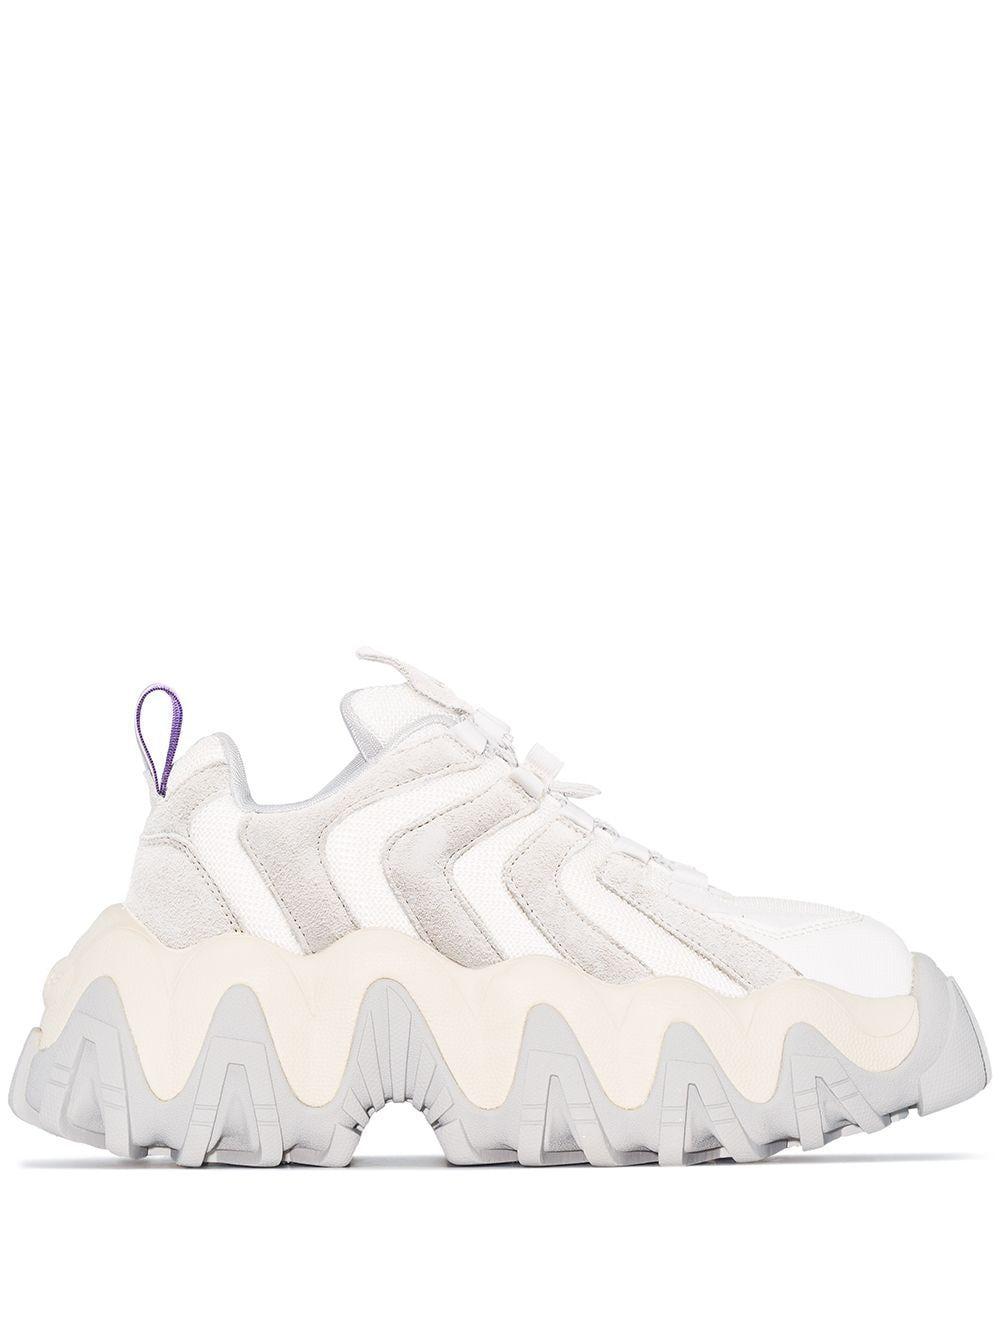 Eytys Halo Chunky Sneakers - Farfetch